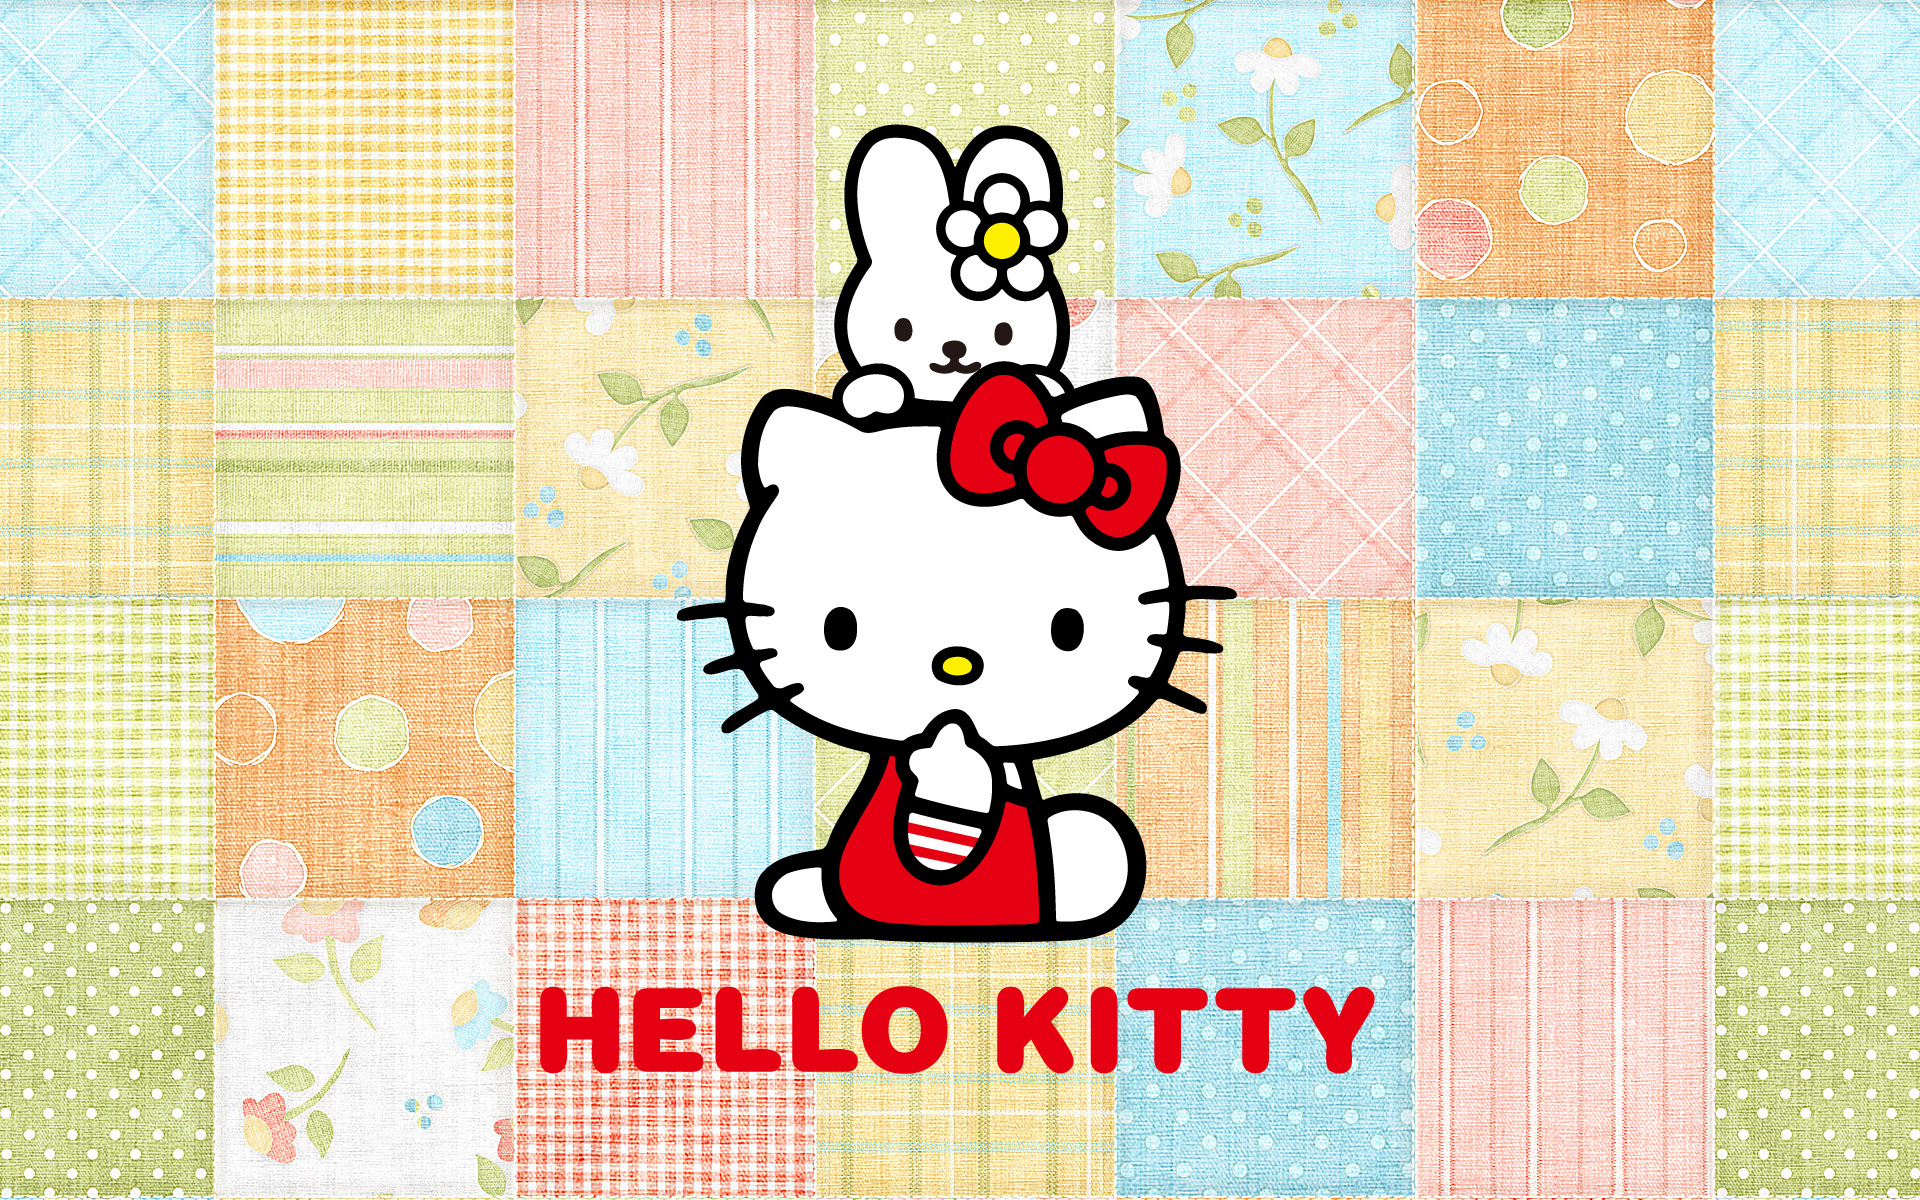 Hello Kitty Free Wallpaper WallpaperJam